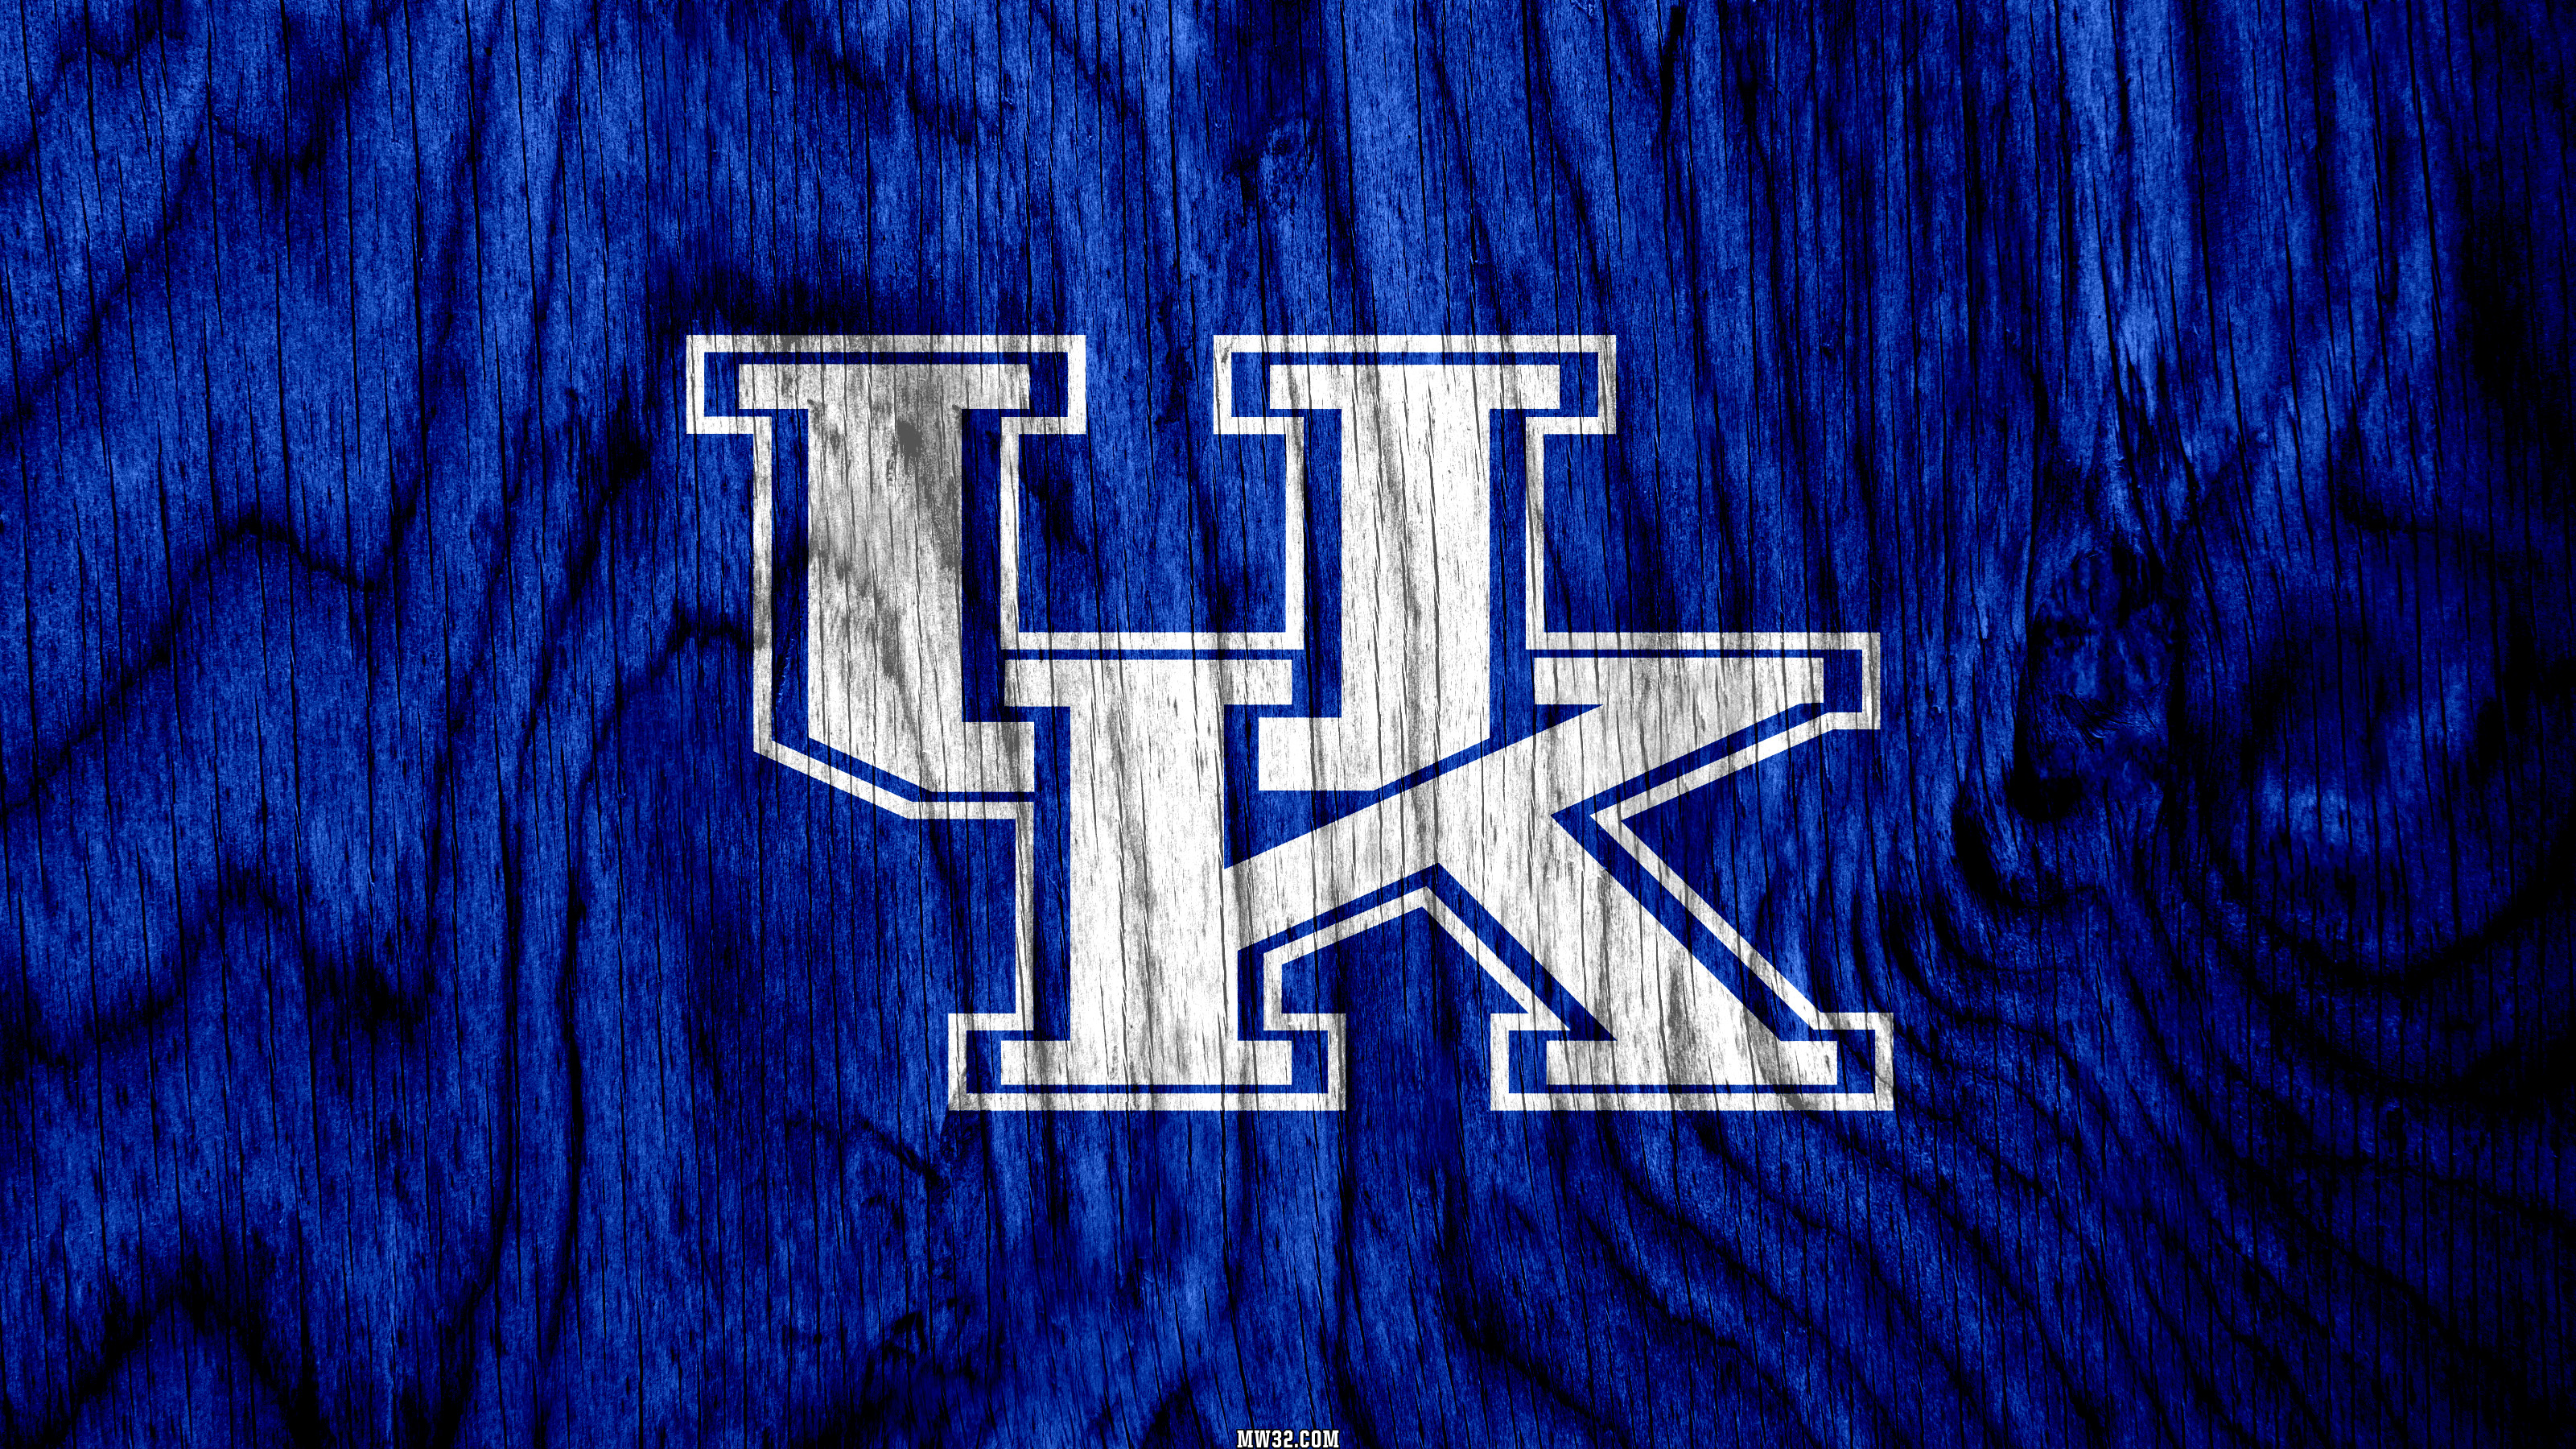 Preview NCAA 2016: Kentucky Wildcats